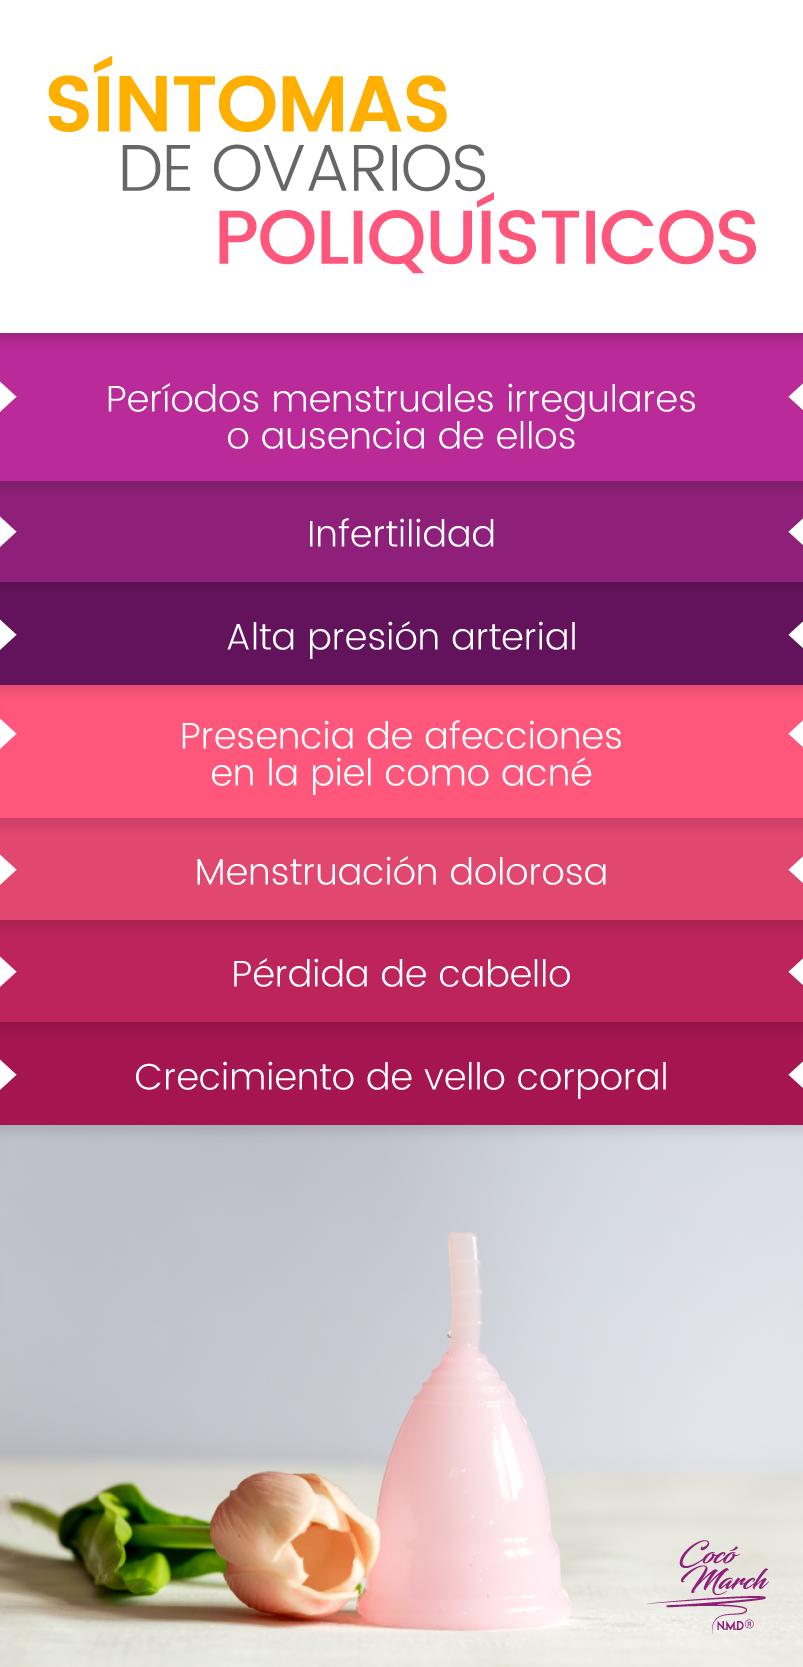 ovarios-poliquisticos-sintomas